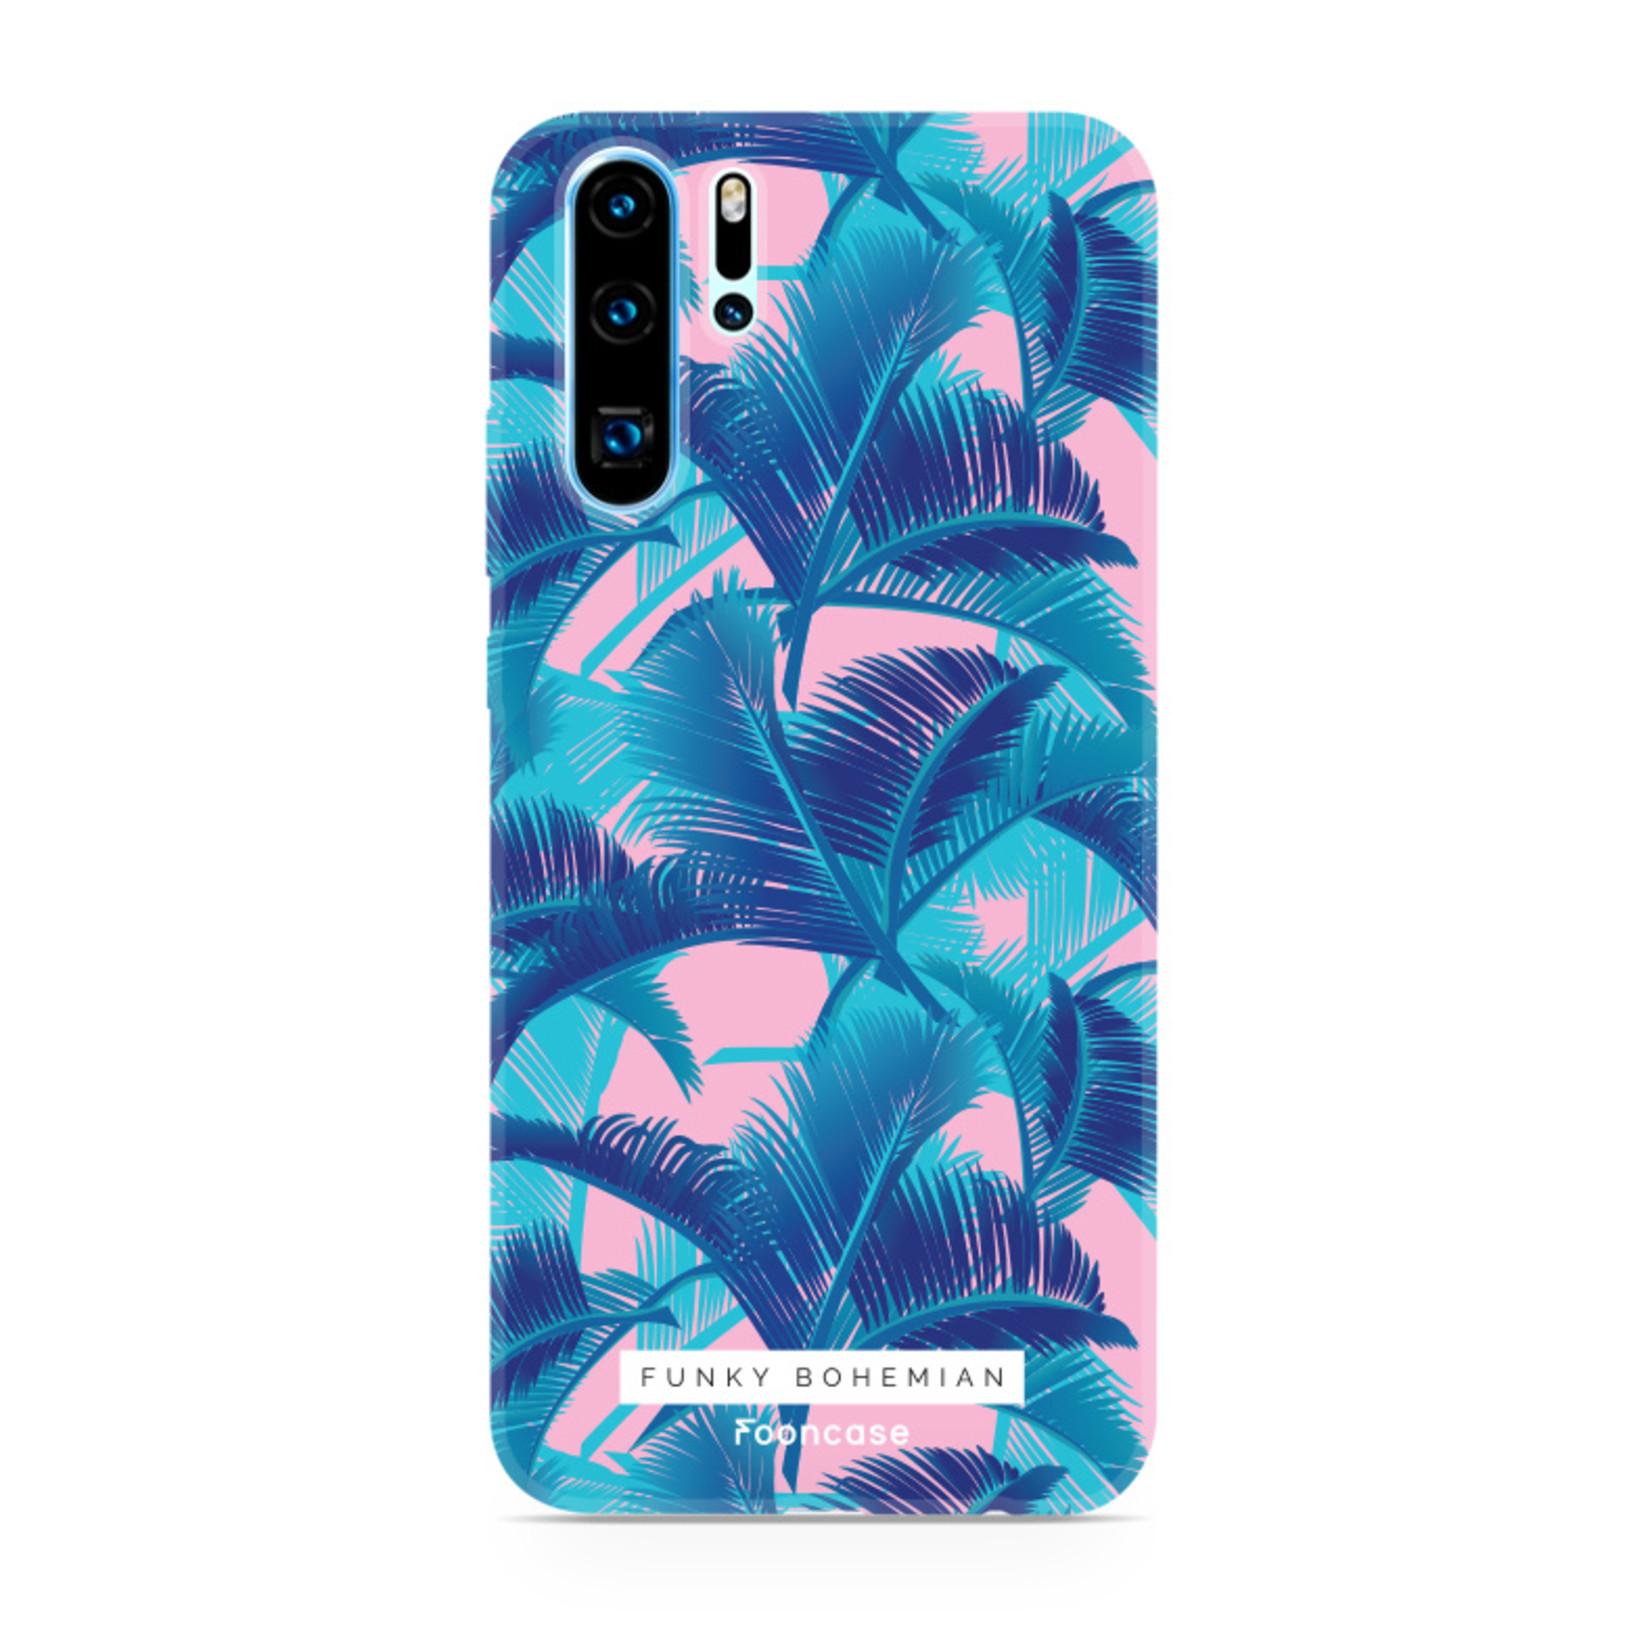 FOONCASE Huawei P30 Pro hoesje TPU Soft Case - Back Cover - Funky Bohemian / Blauw Roze Bladeren